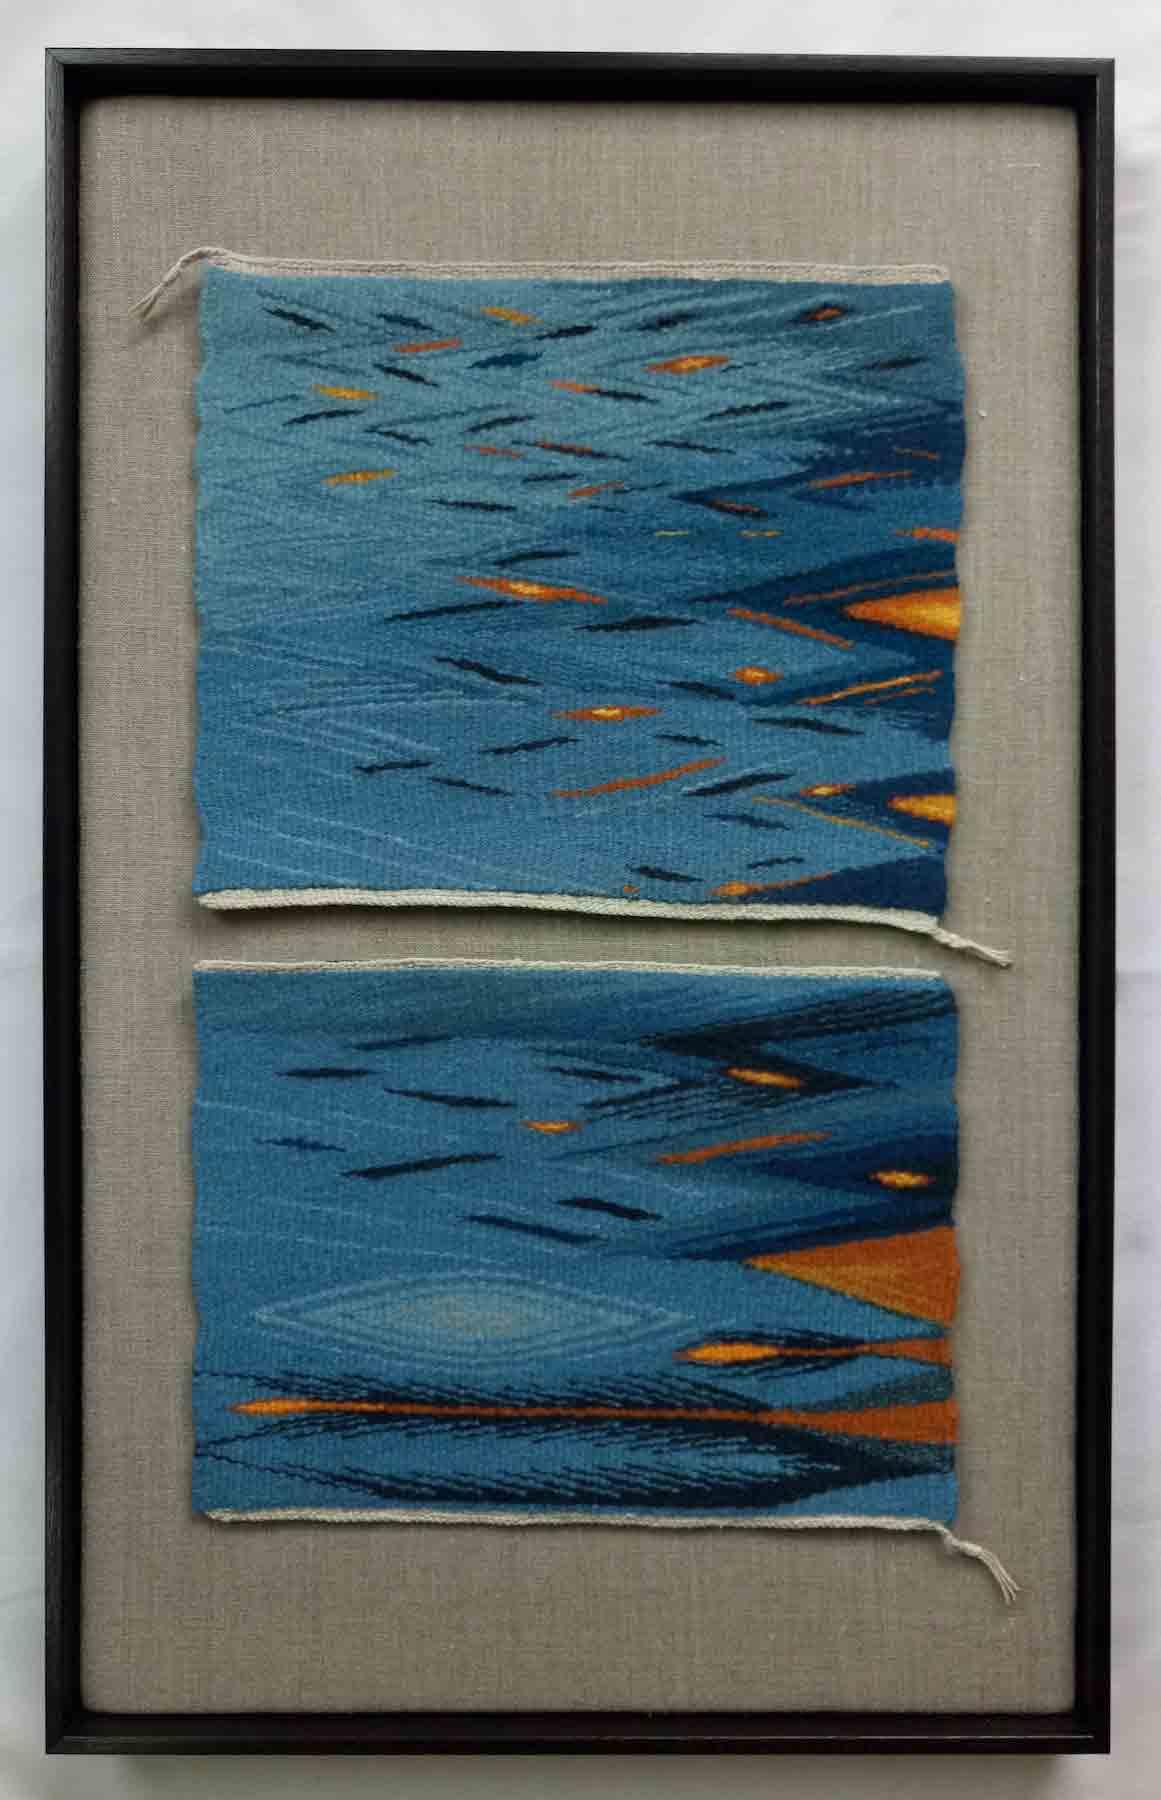 Reflections, Minna Rothman